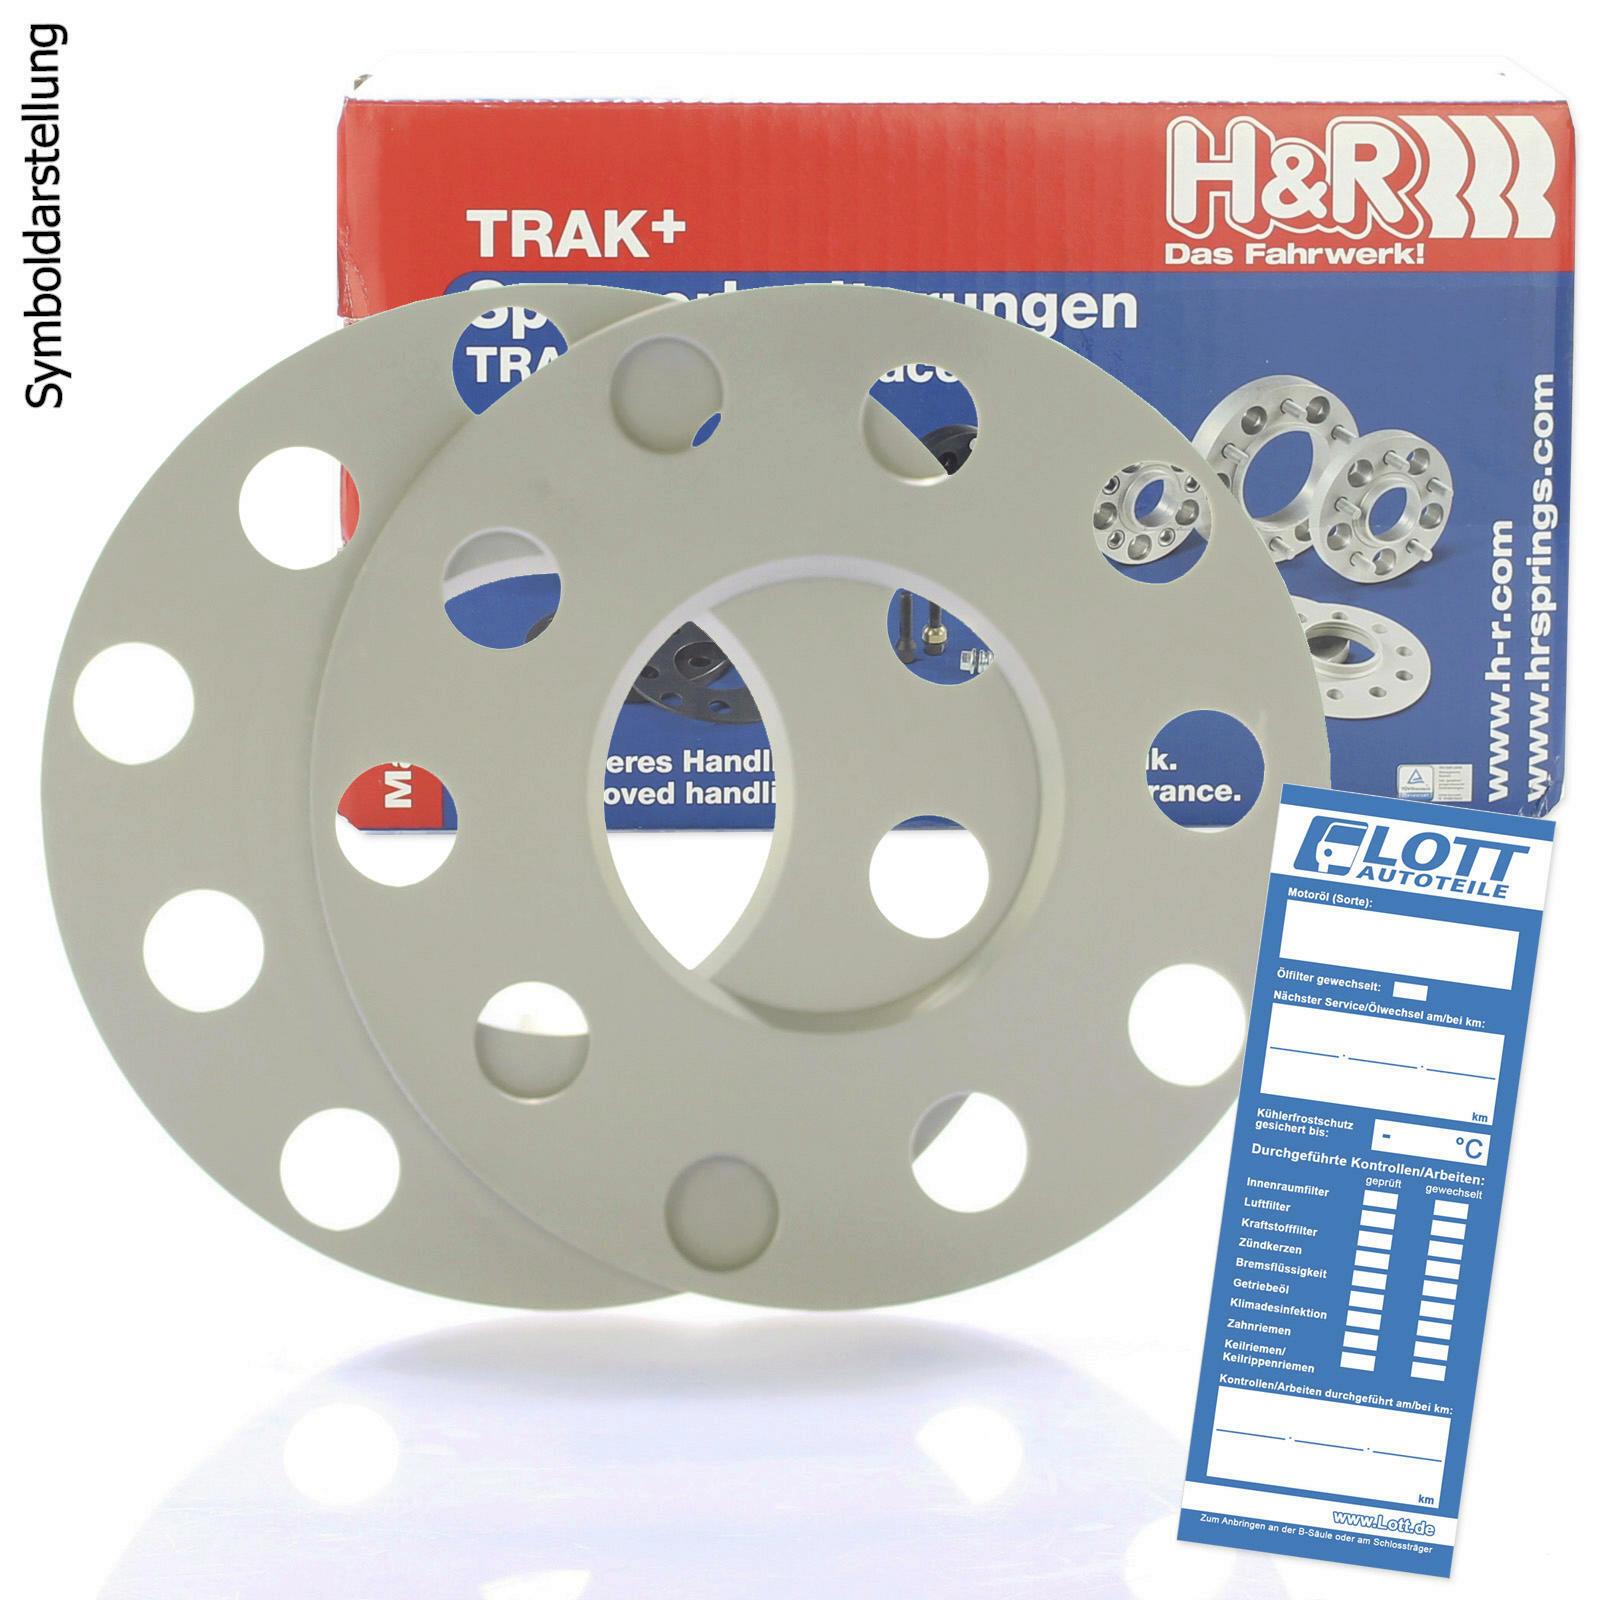 H&R DR Spurplatten Spurverbreiterung Distanzscheibe 5x100 10mm // 2x5mm